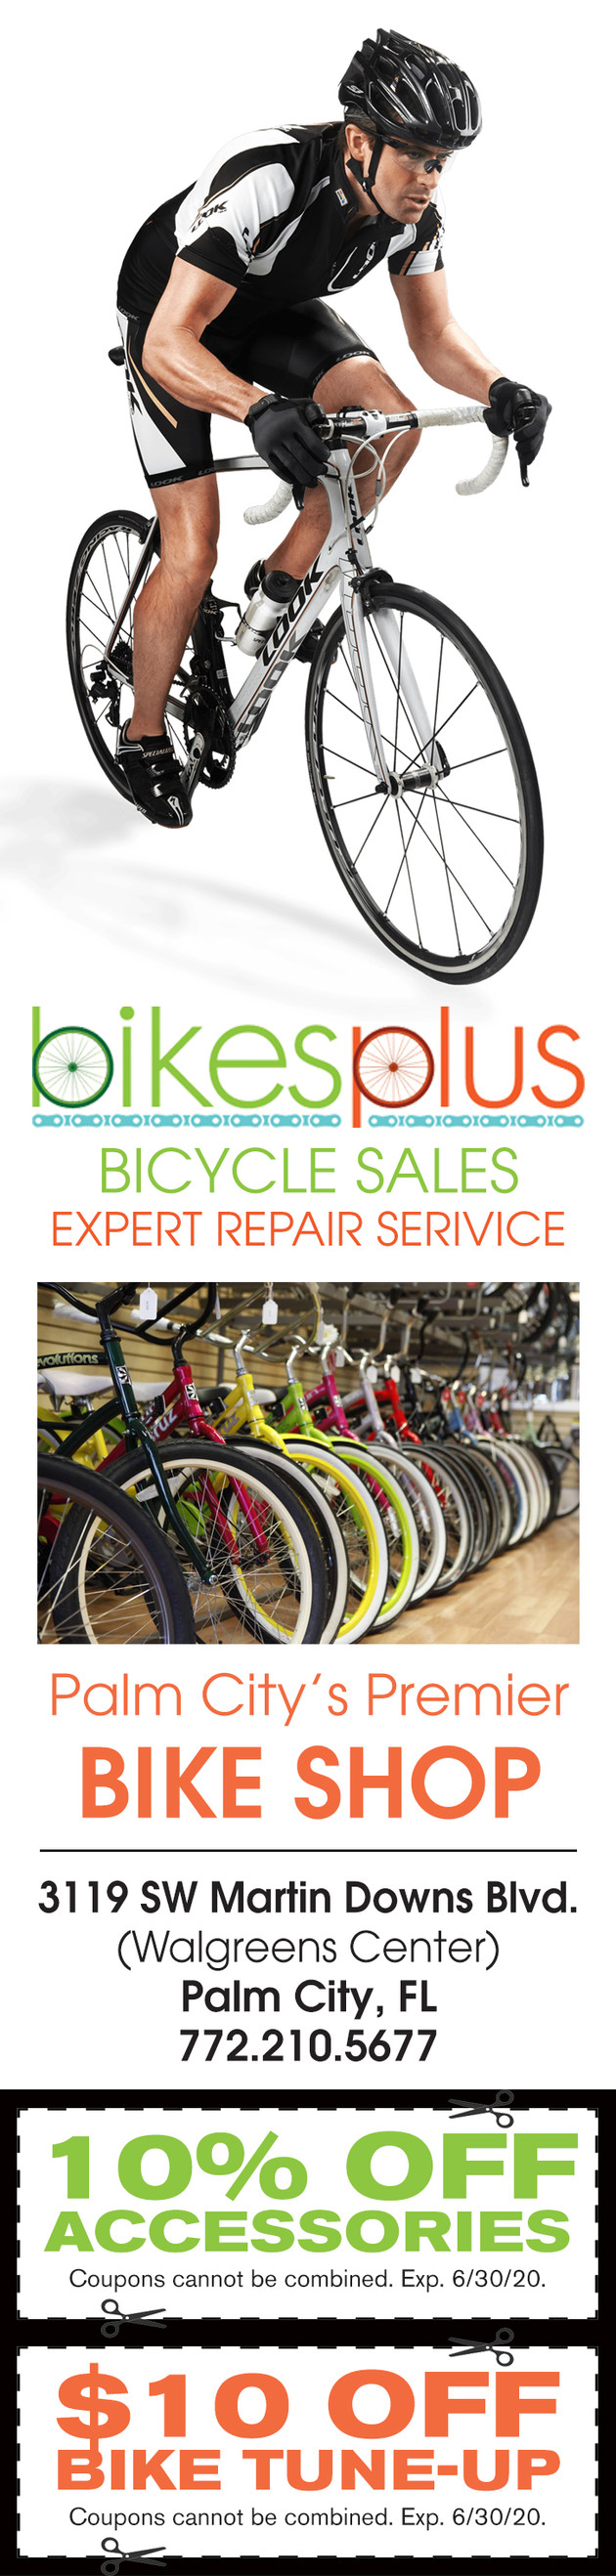 Bike's Plus Palm City